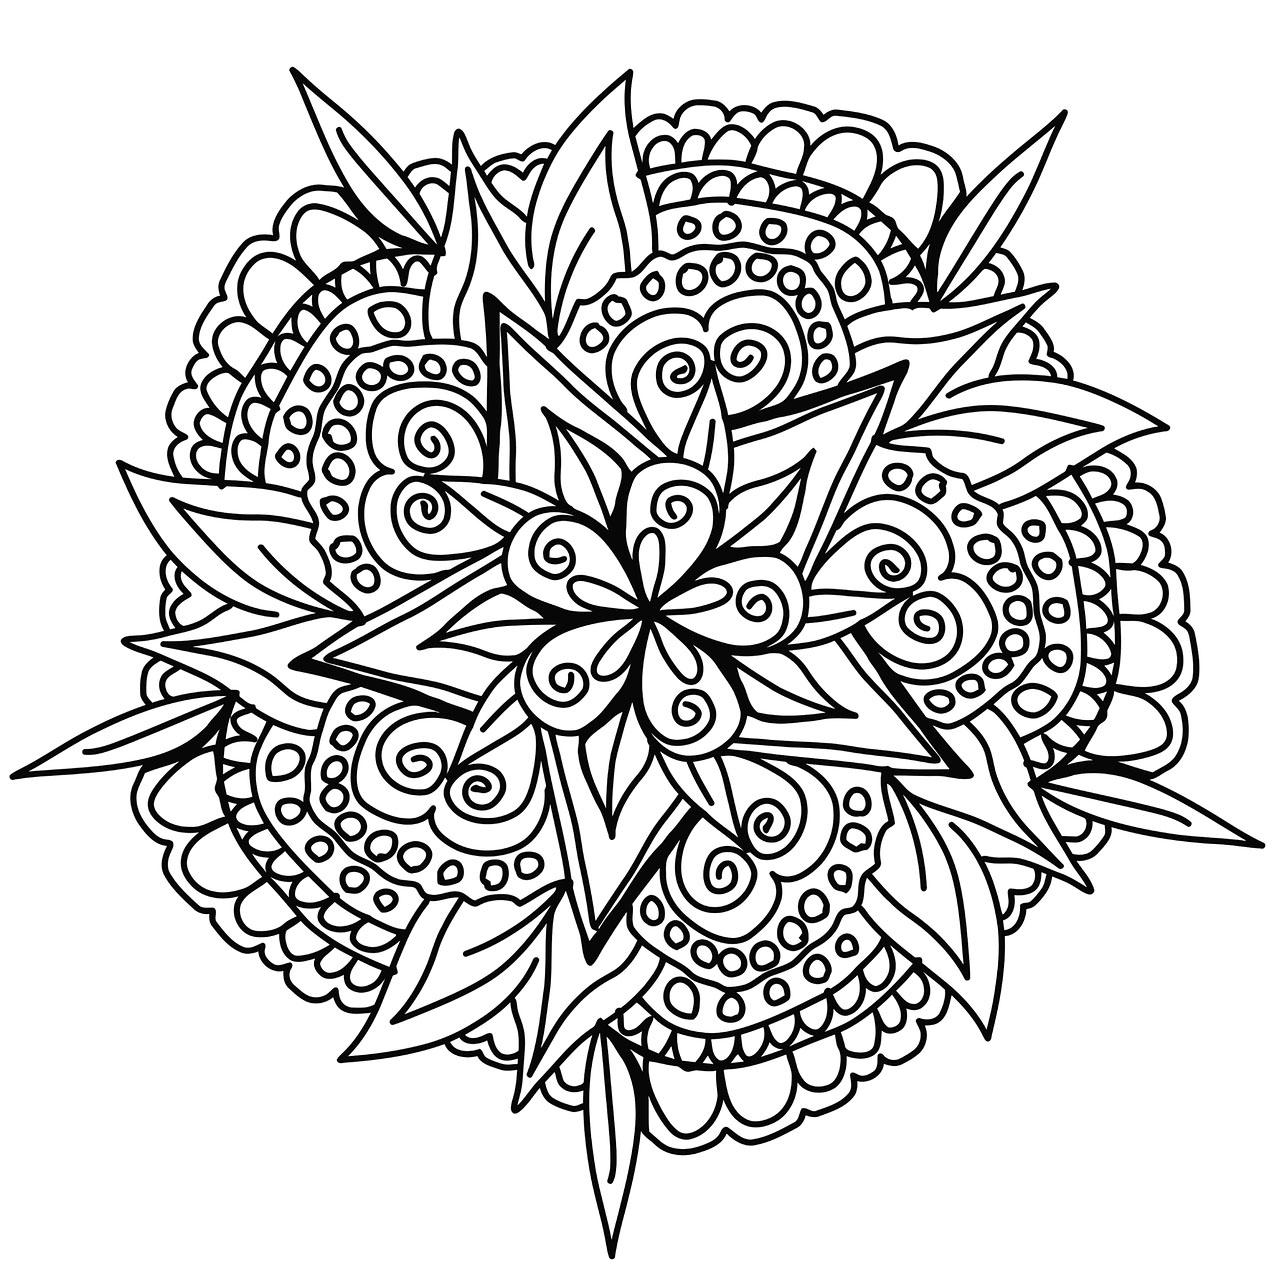 Vegetal Hand Drawn Mandala - Simple Mandalas - 100% Mandalas pour Dessiner Un Mandala